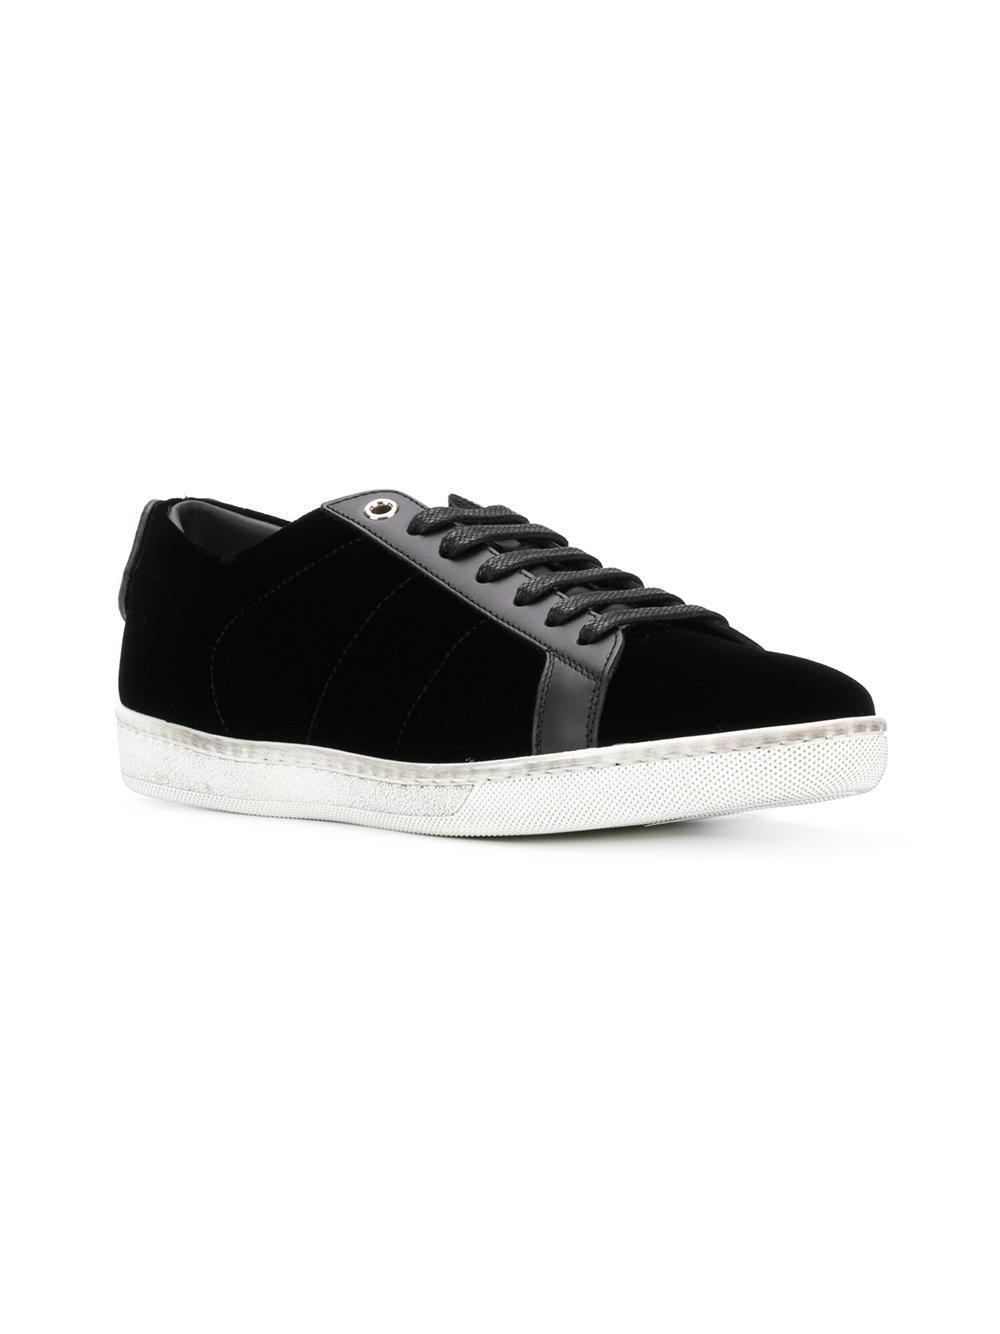 Saint Laurent Signature Court Classic SL/01 Lips sneakers - Black farfetch neri i4uvmozQ